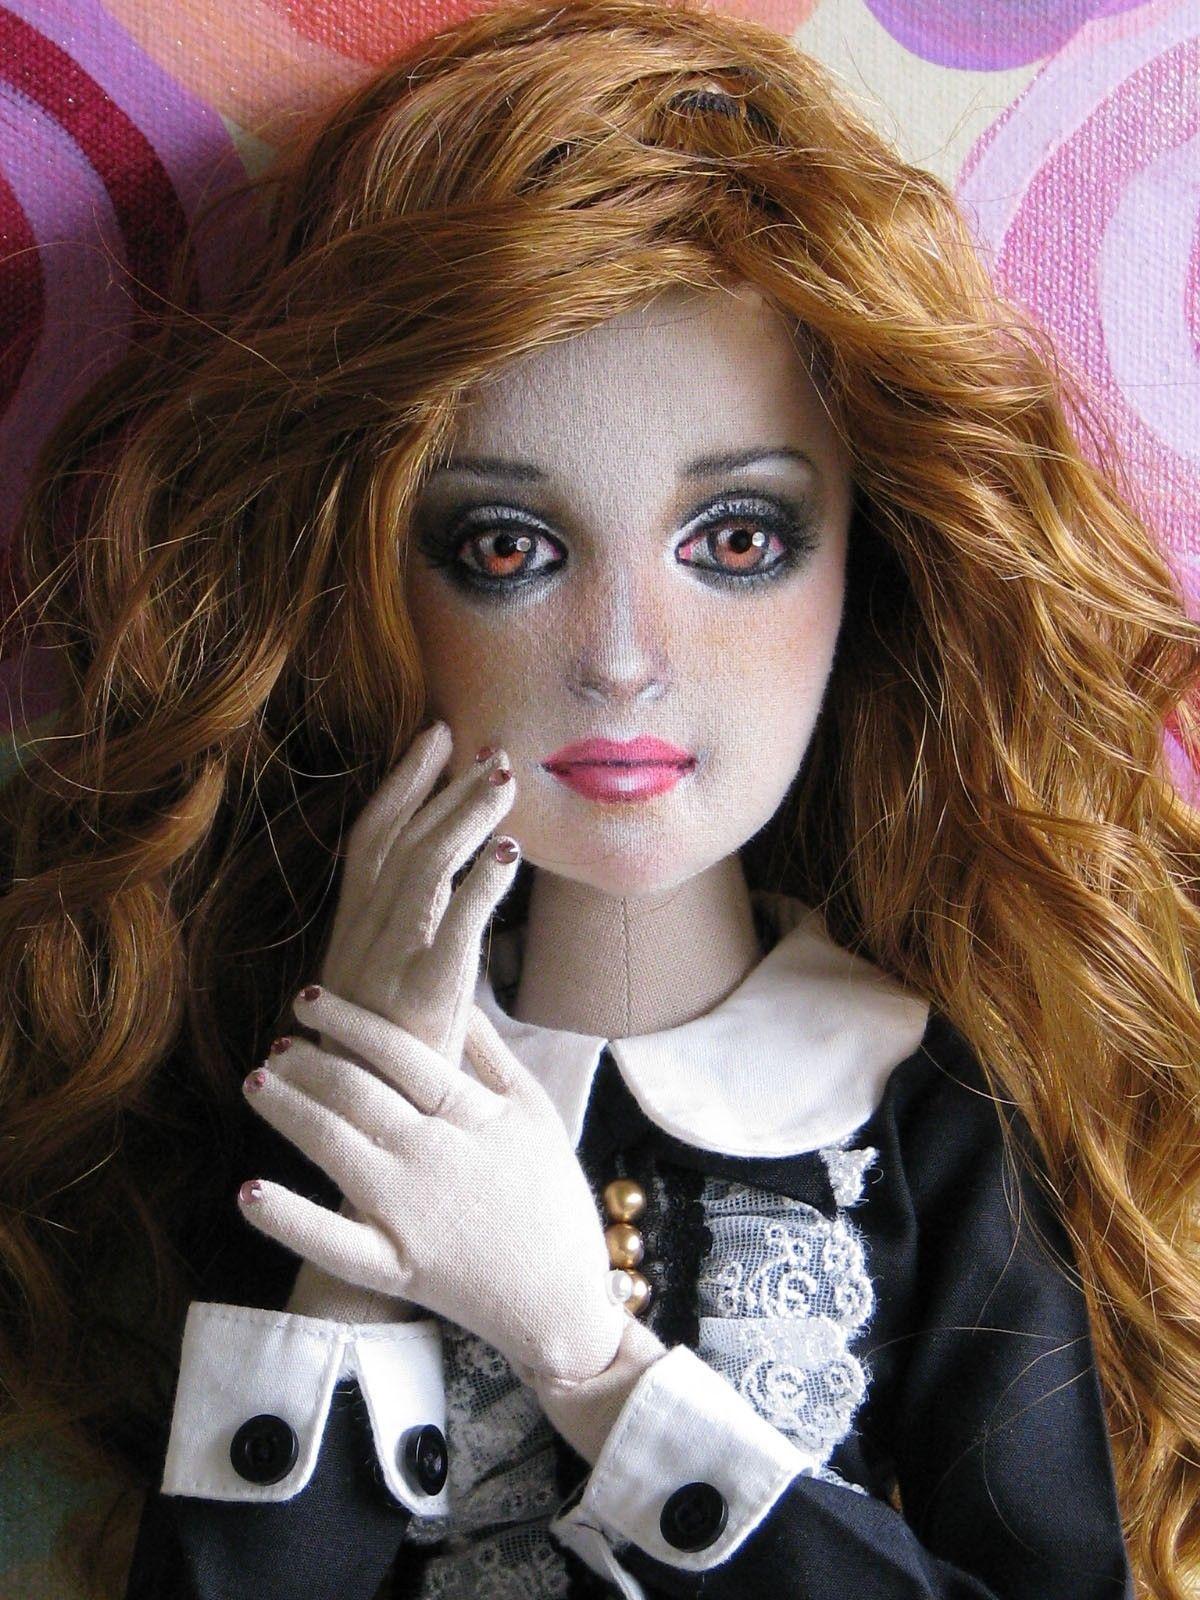 "OOAK Tess 22"" Tall Slim Lady Art Doll Textileposable BJD Size by Gayle Wray | eBay"